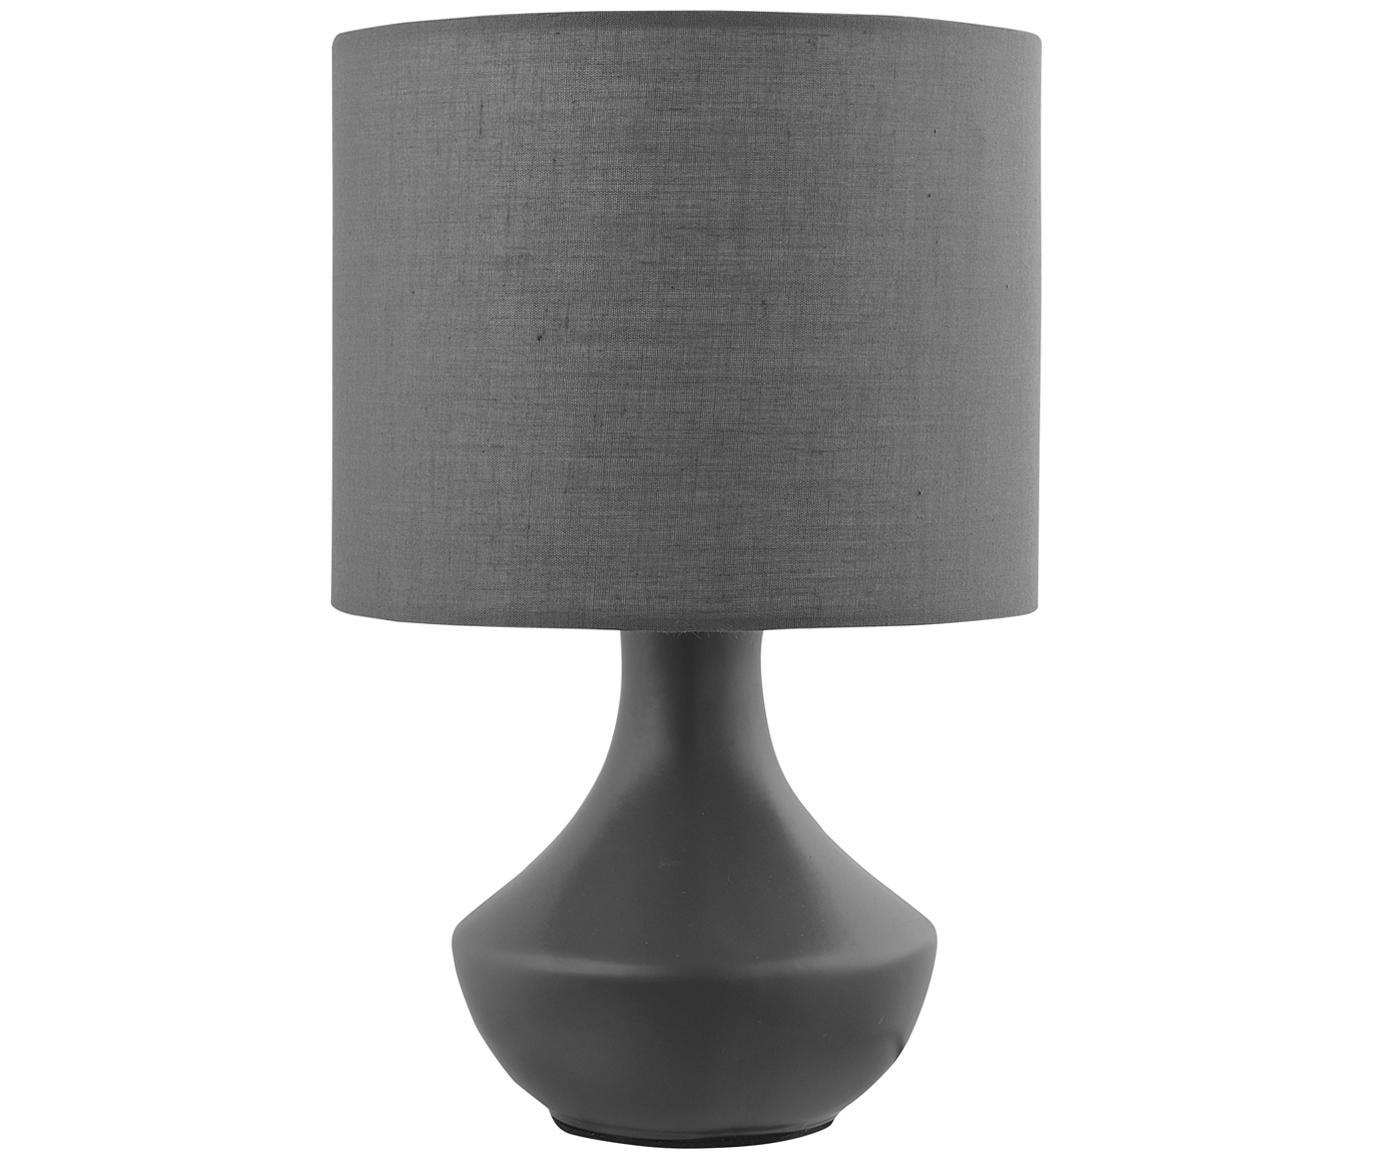 Tafellamp Rosia, Lampenkap: polyester, Lampvoet: gelakt metaal, Grijs, Ø 18 x H 26 cm